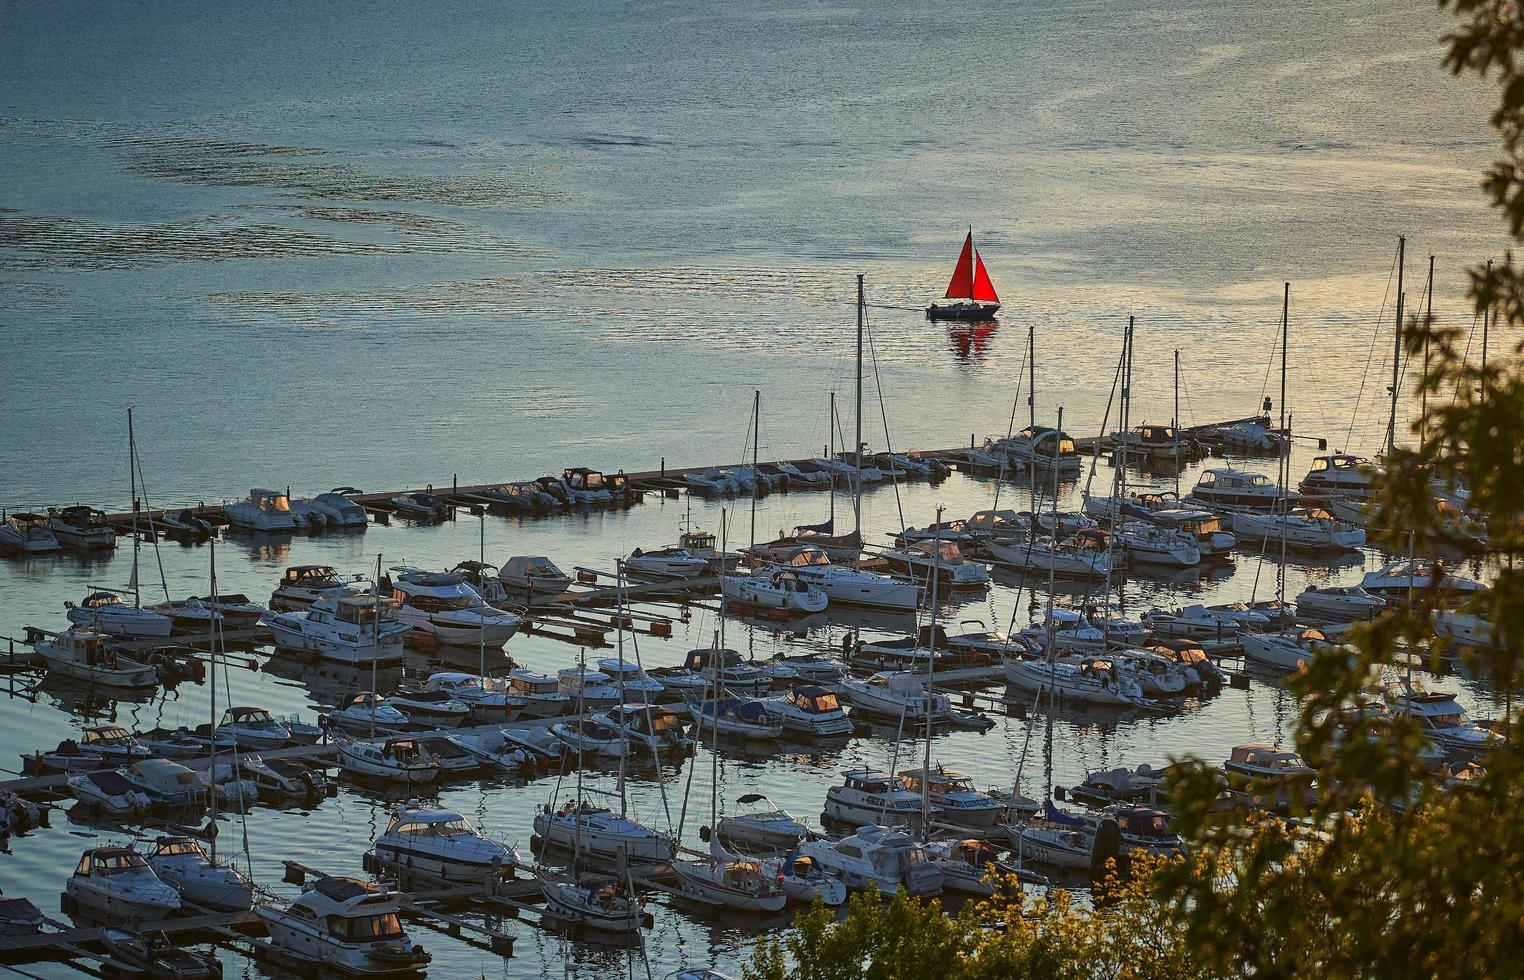 A single red sailboat photo